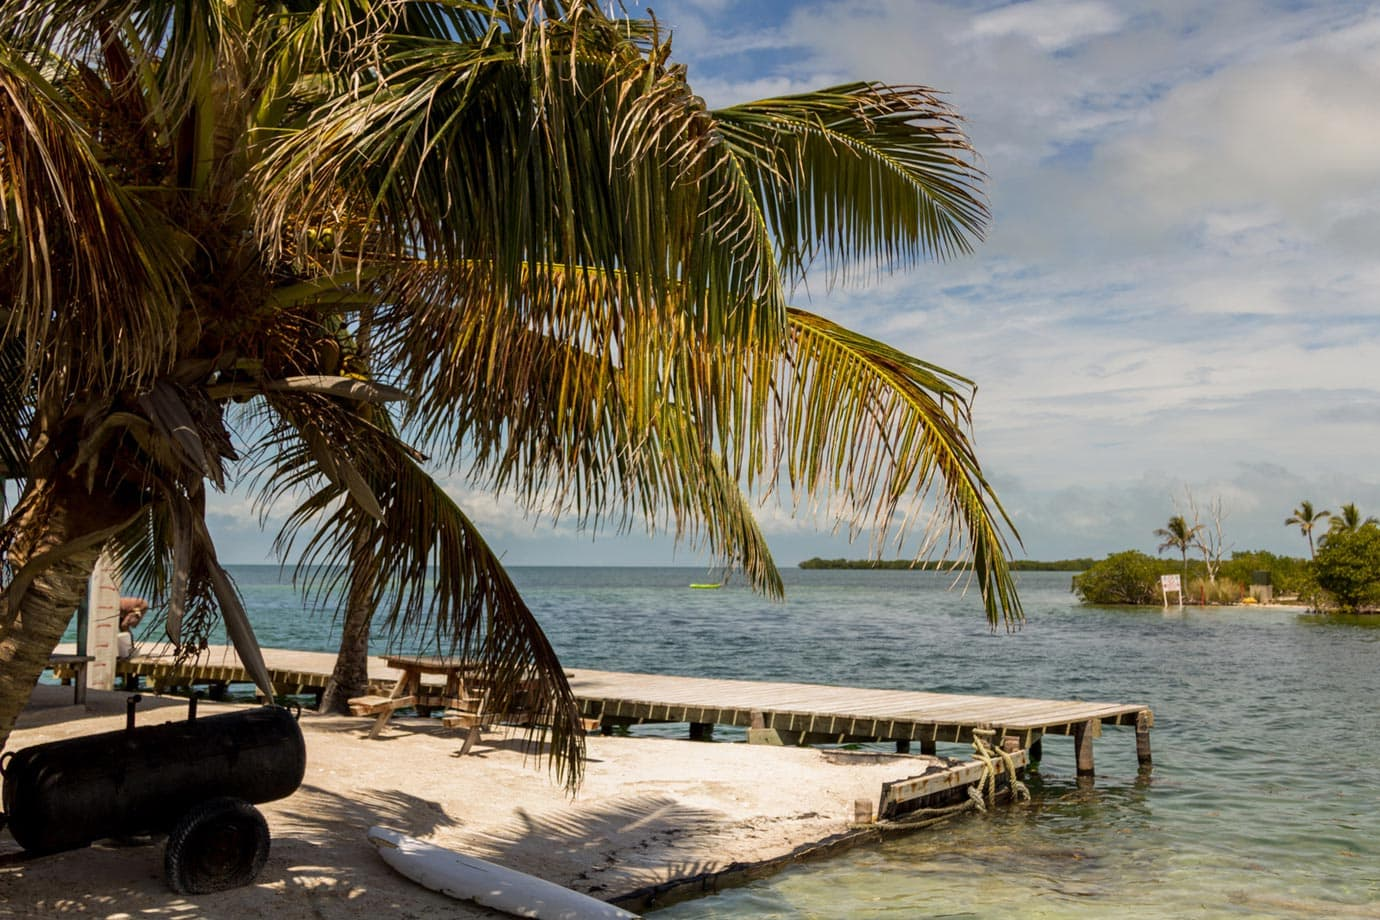 Caye Caulker is a paradise island